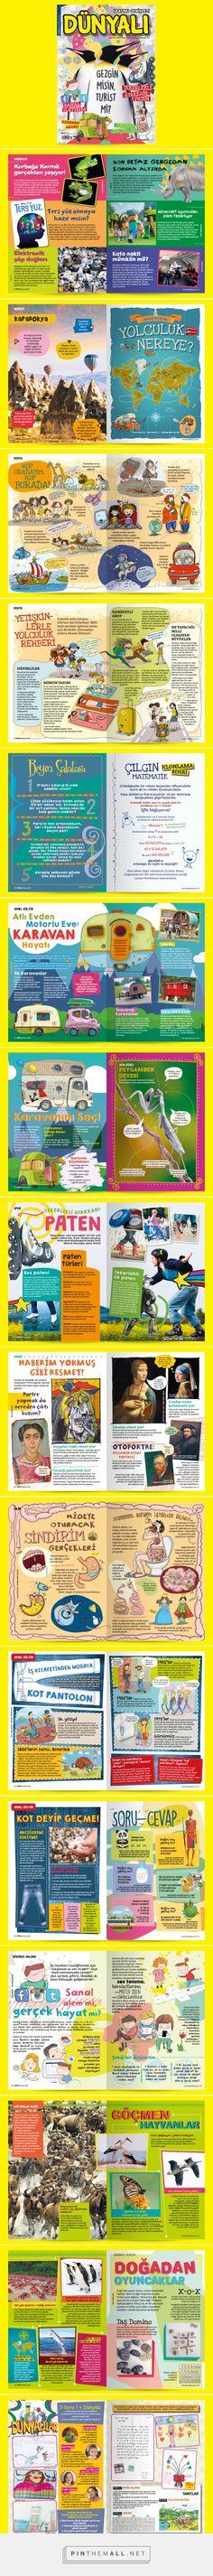 Dünyalı Dergi 15 - Dünyalı Magazine for kids on Behance... - a grouped images picture - Pin Them All